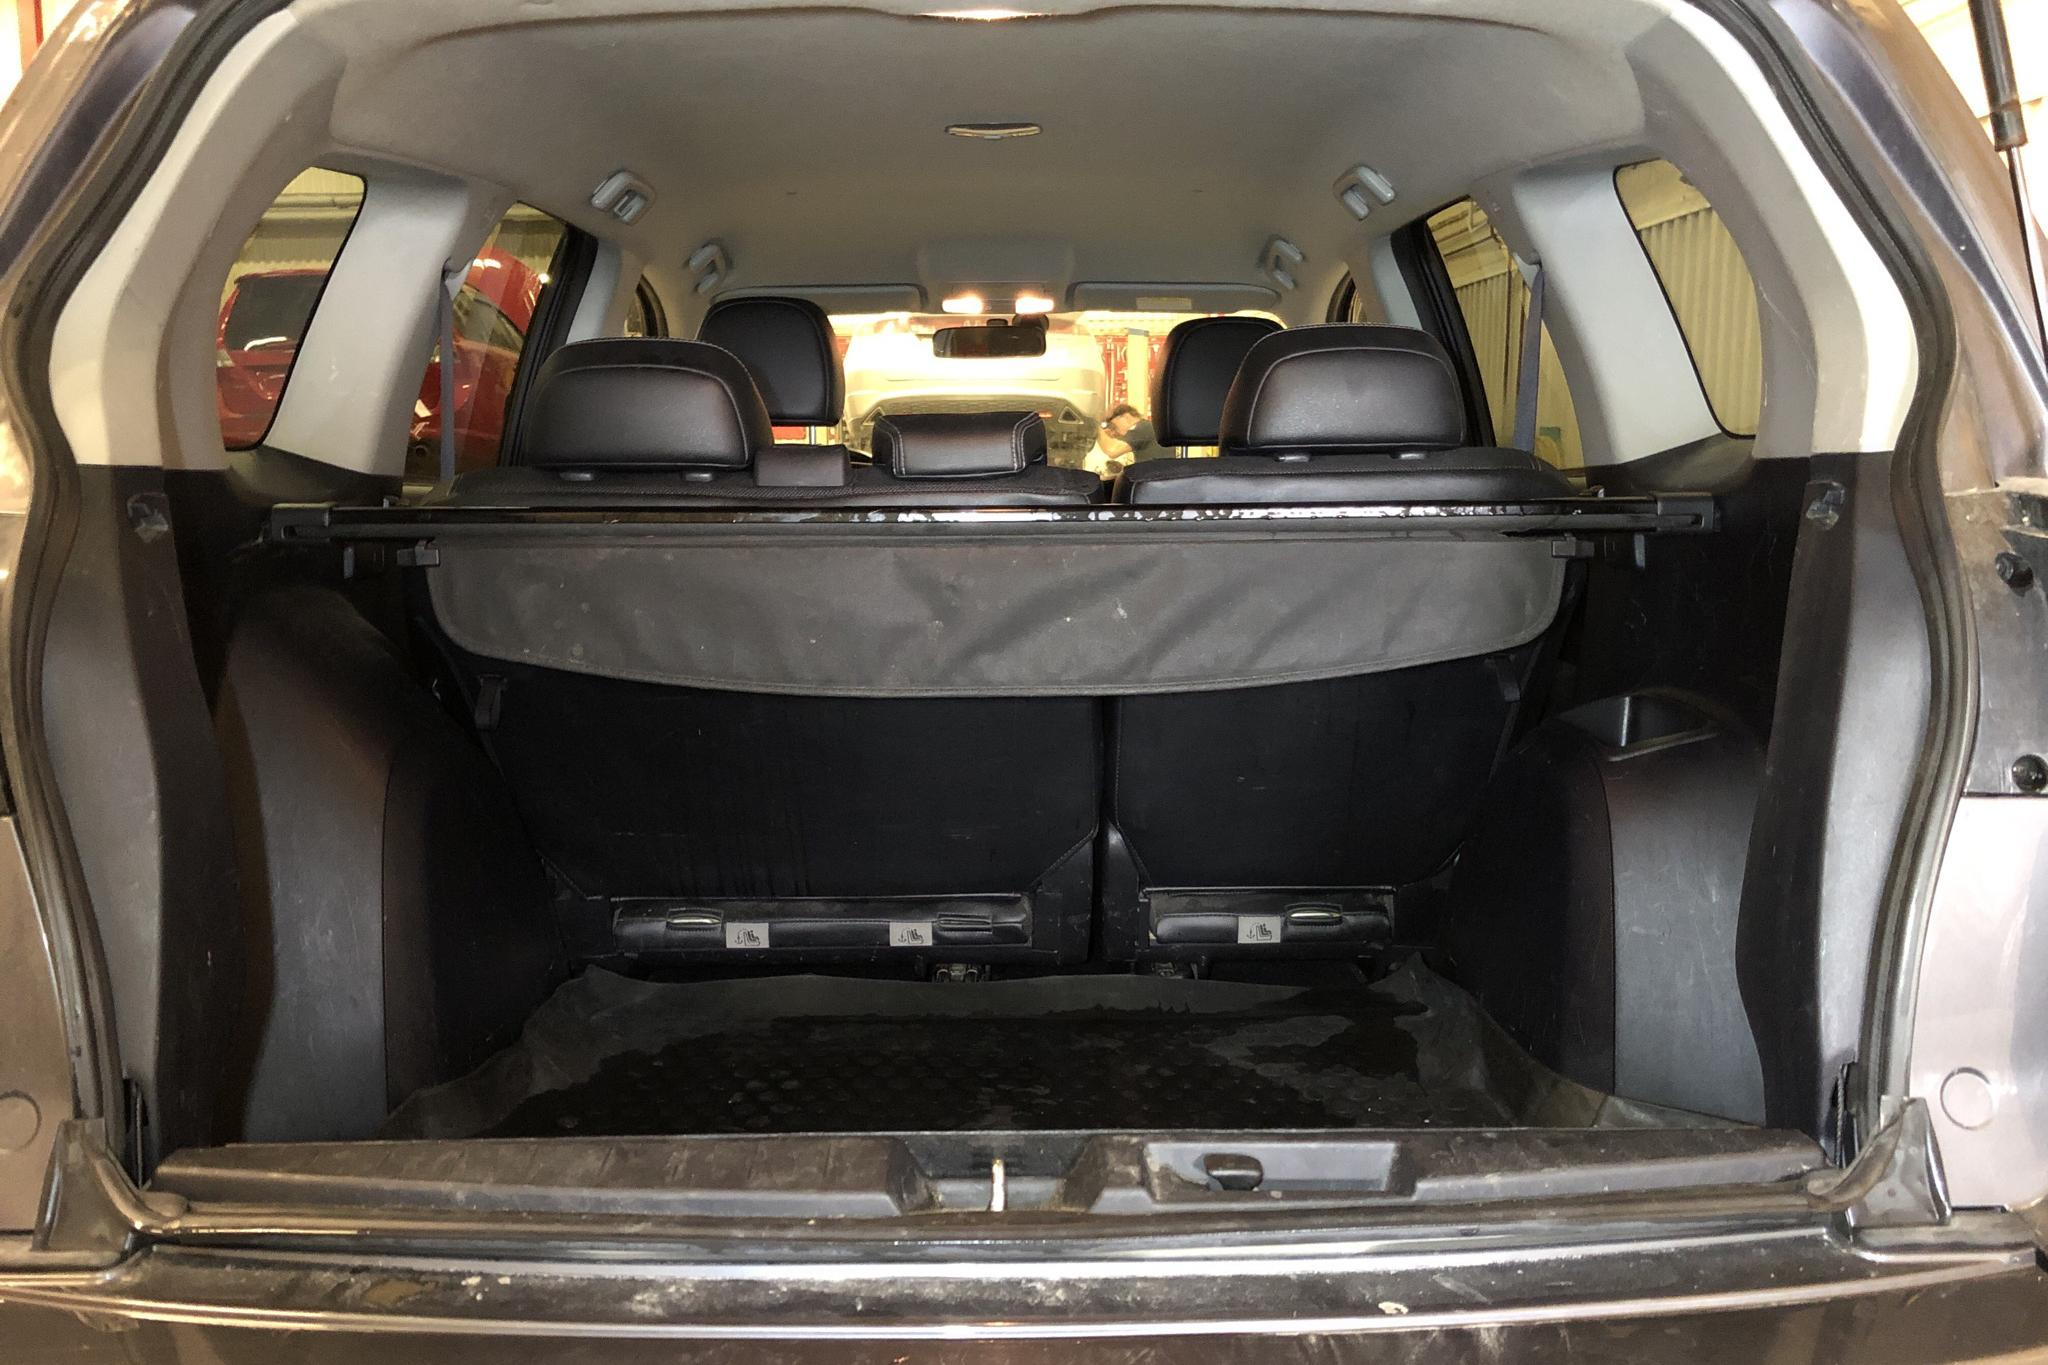 Mitsubishi Outlander 2.4 FFV (170hk) - 26 306 mil - Automat - Dark Grey - 2011